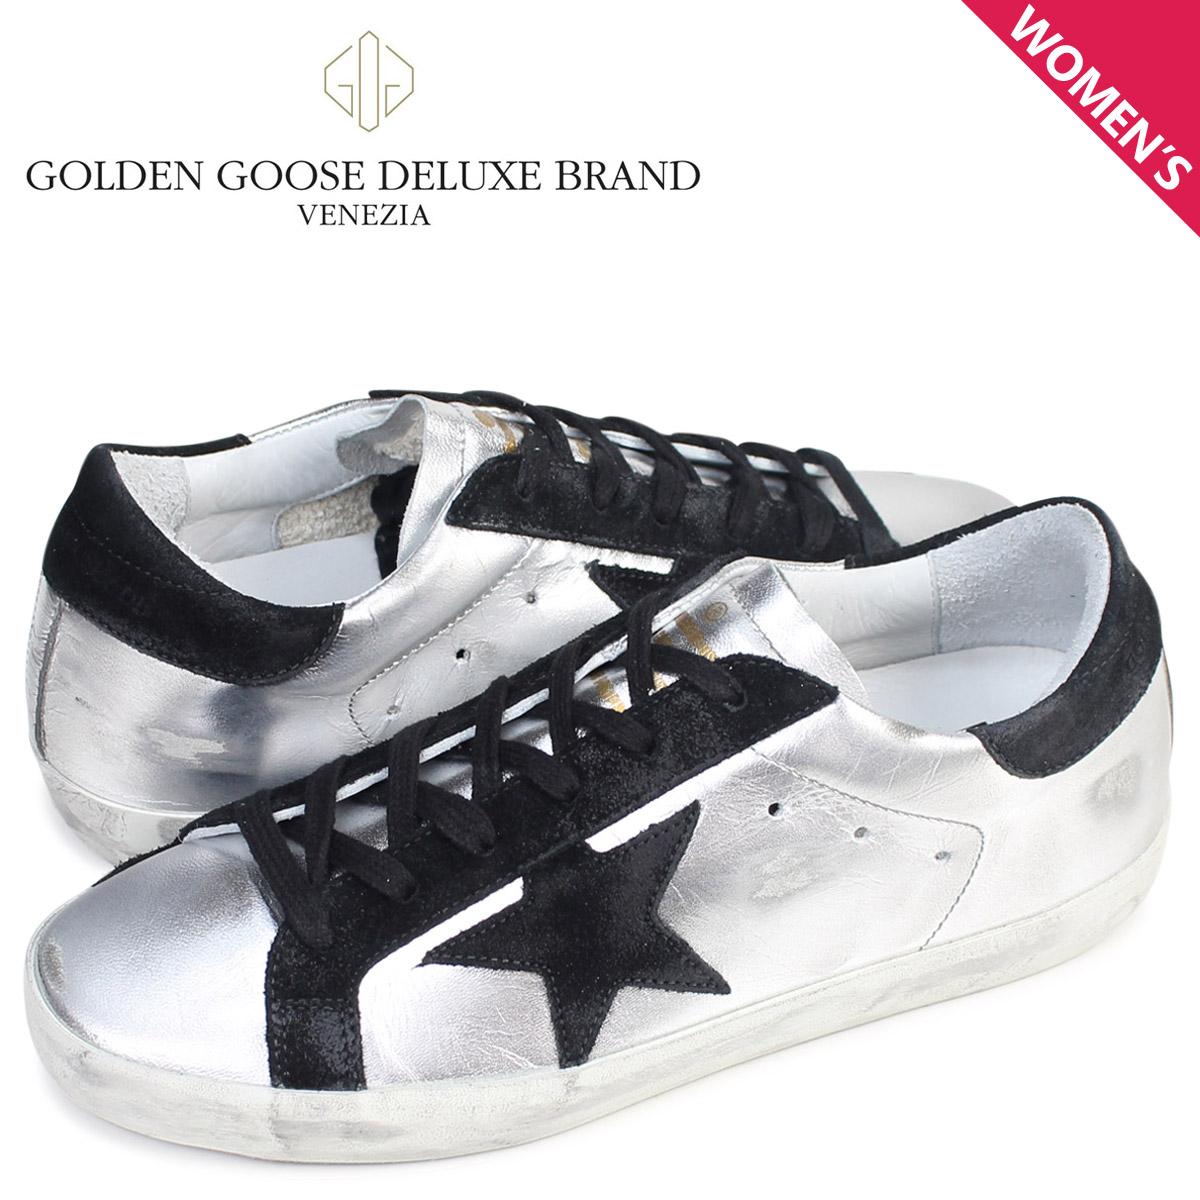 Golden Goose ゴールデングース スニーカー レディース スーパースター SNEAKERS SUPERSTAR イタリア製 GCOWS590 A8 靴 シルバー